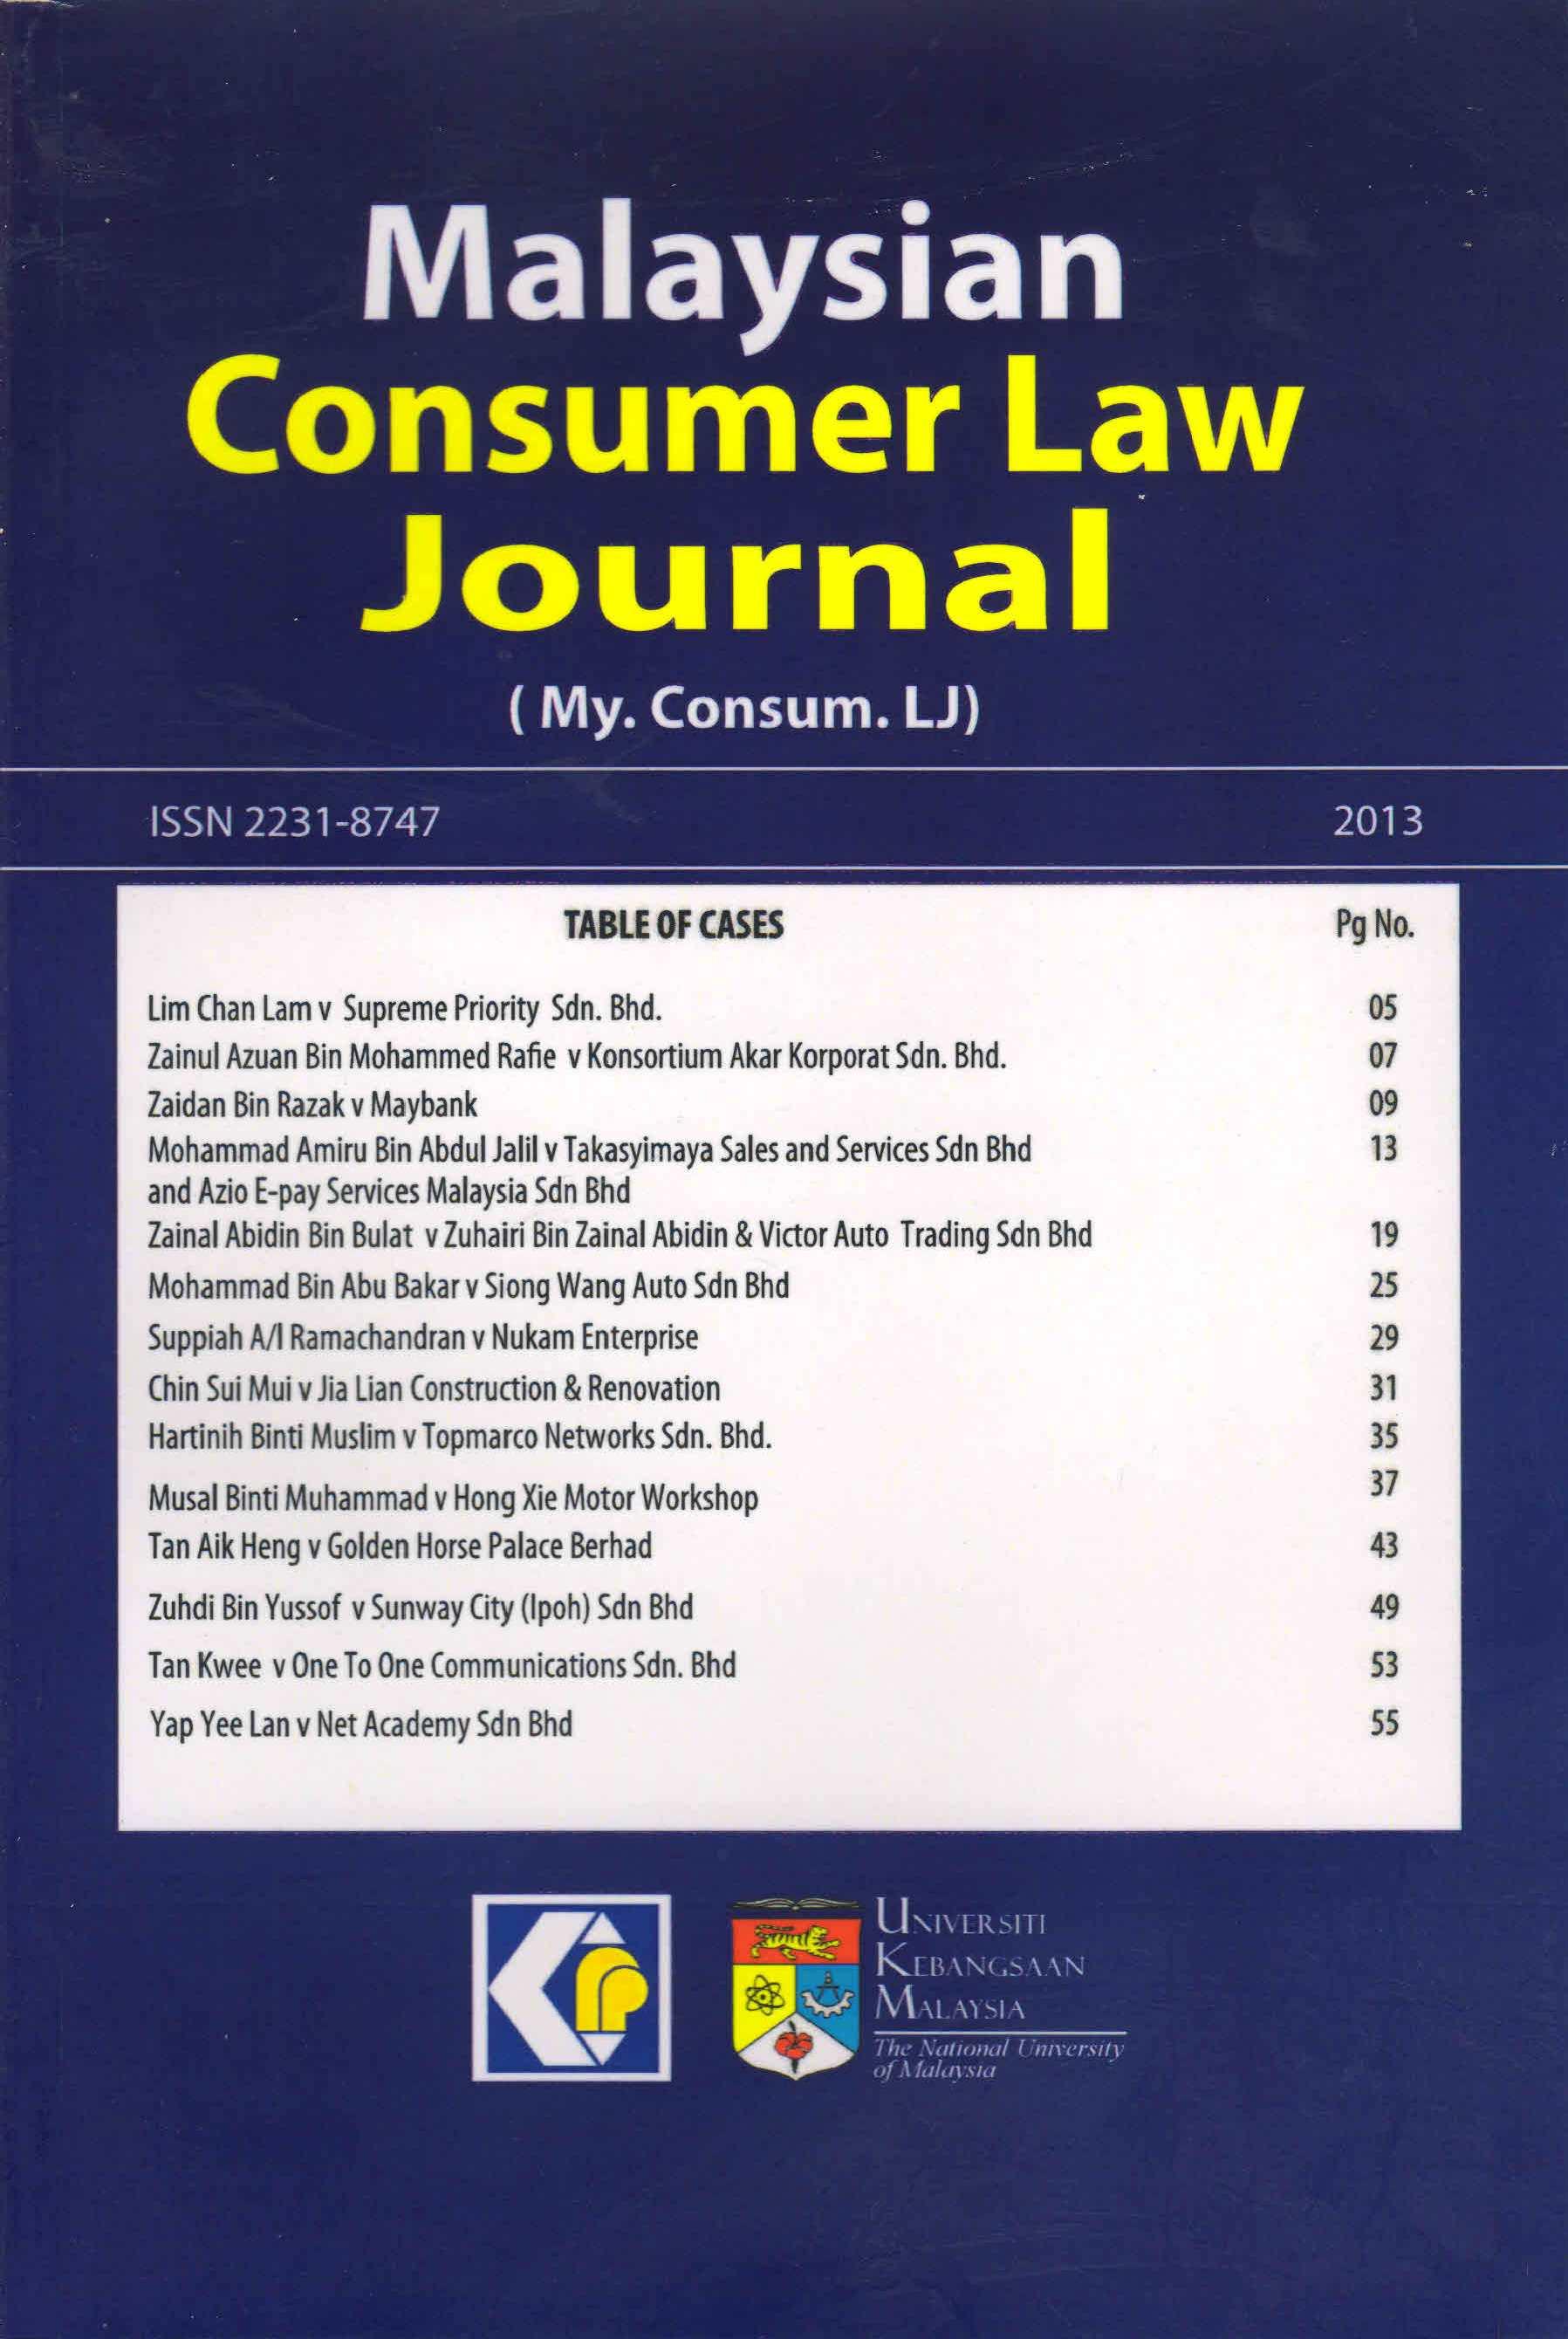 consumer journal 2013